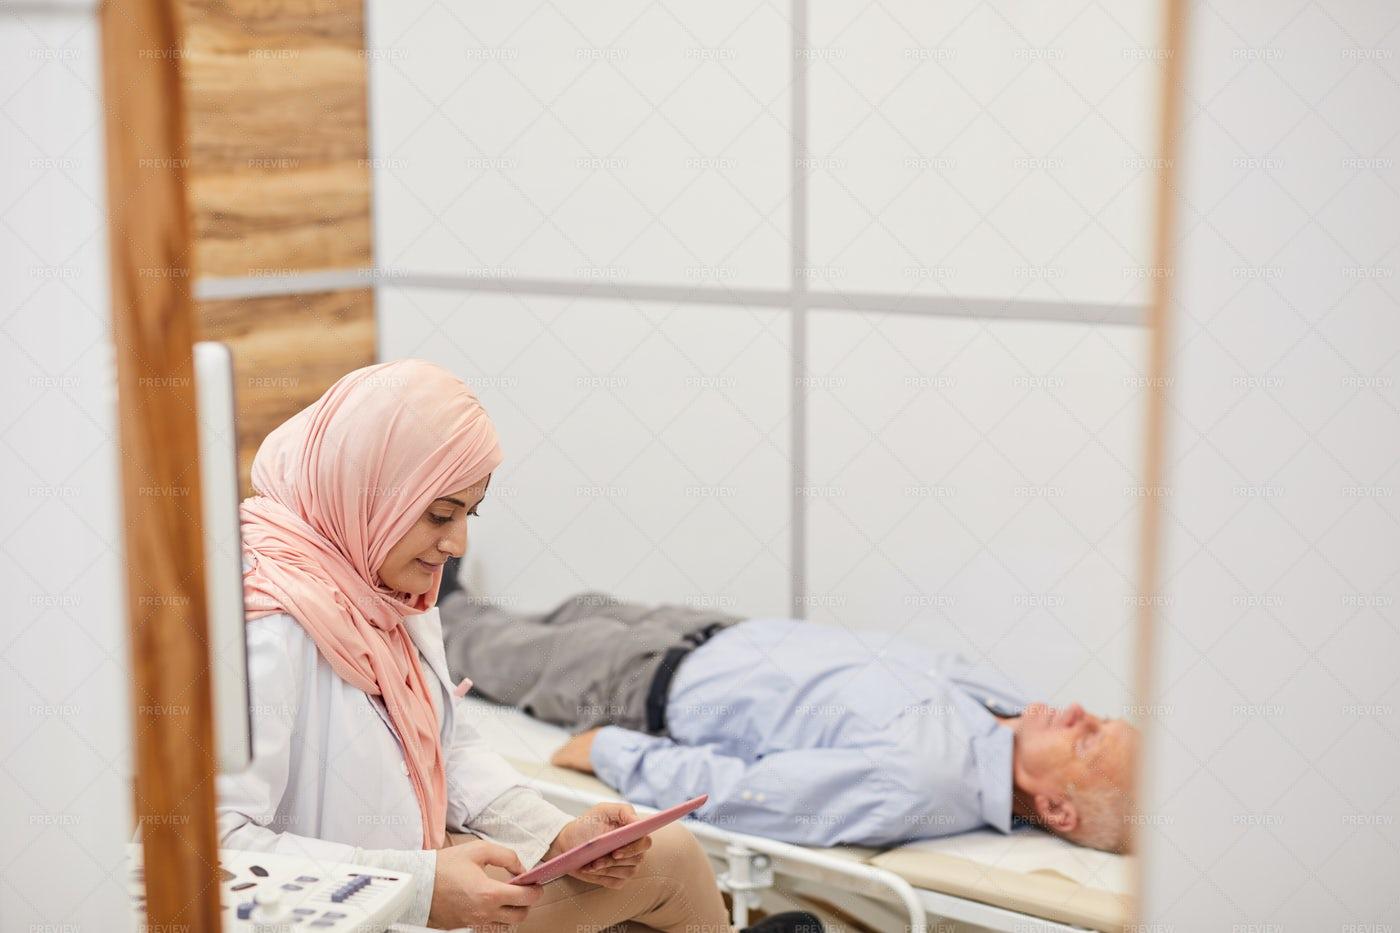 Medical Procedures In Clinic: Stock Photos